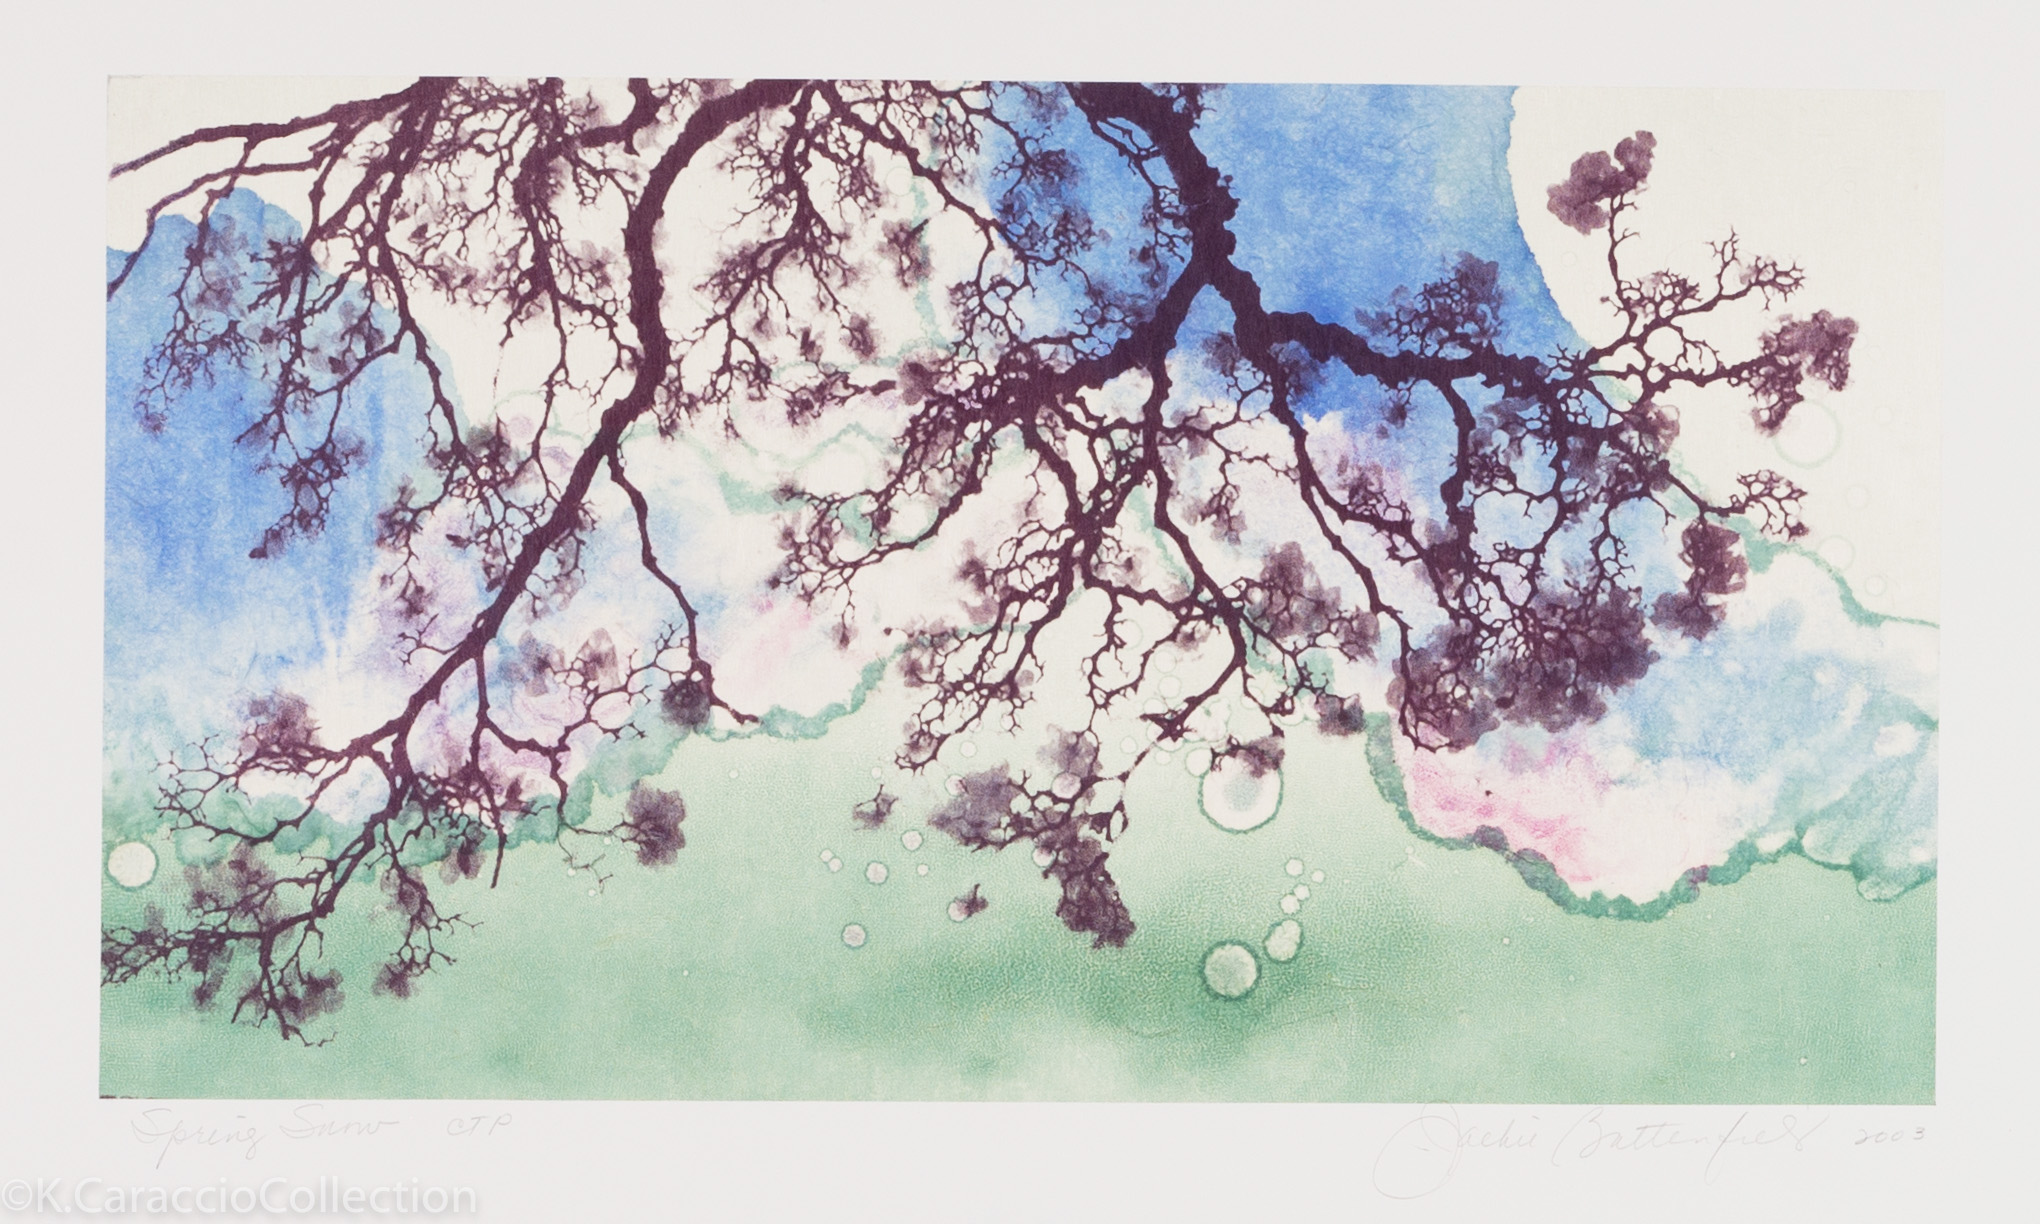 Spring Snow, 2003